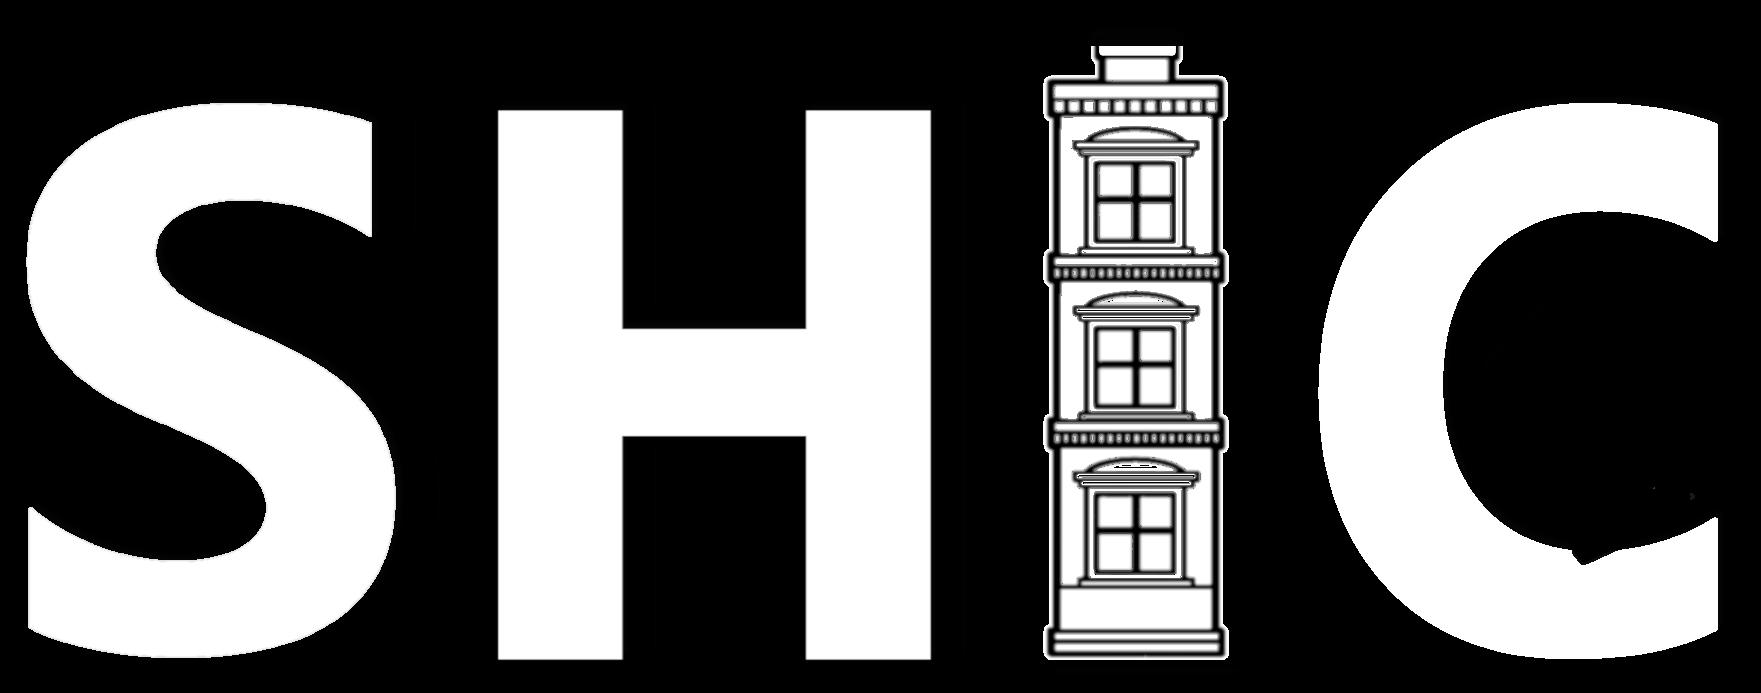 1 SHIC logo BW transparent bg.png